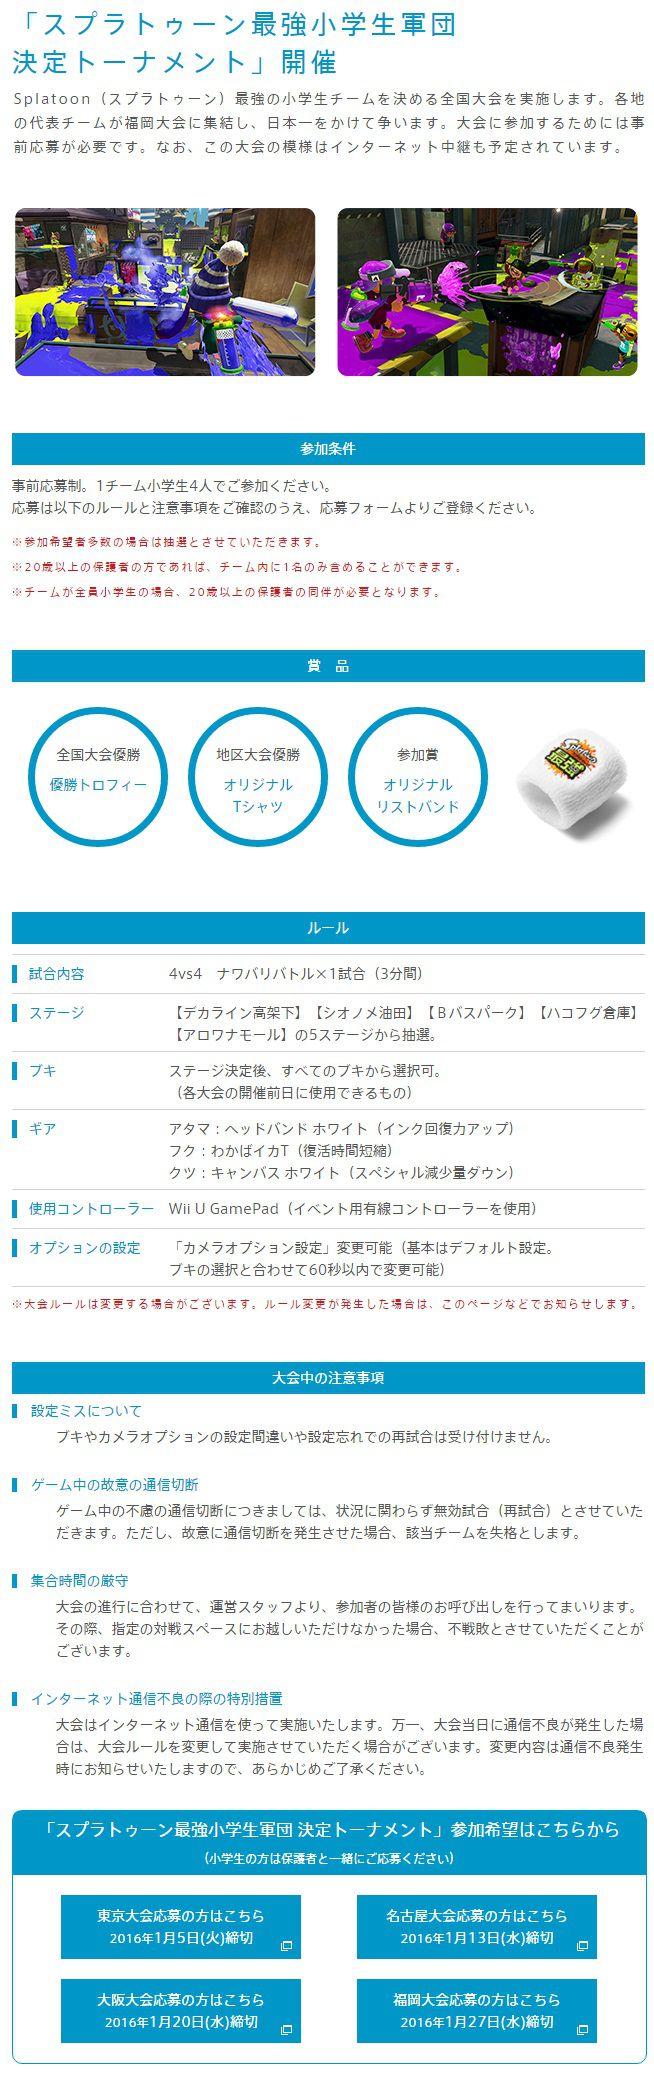 image_3377.jpg